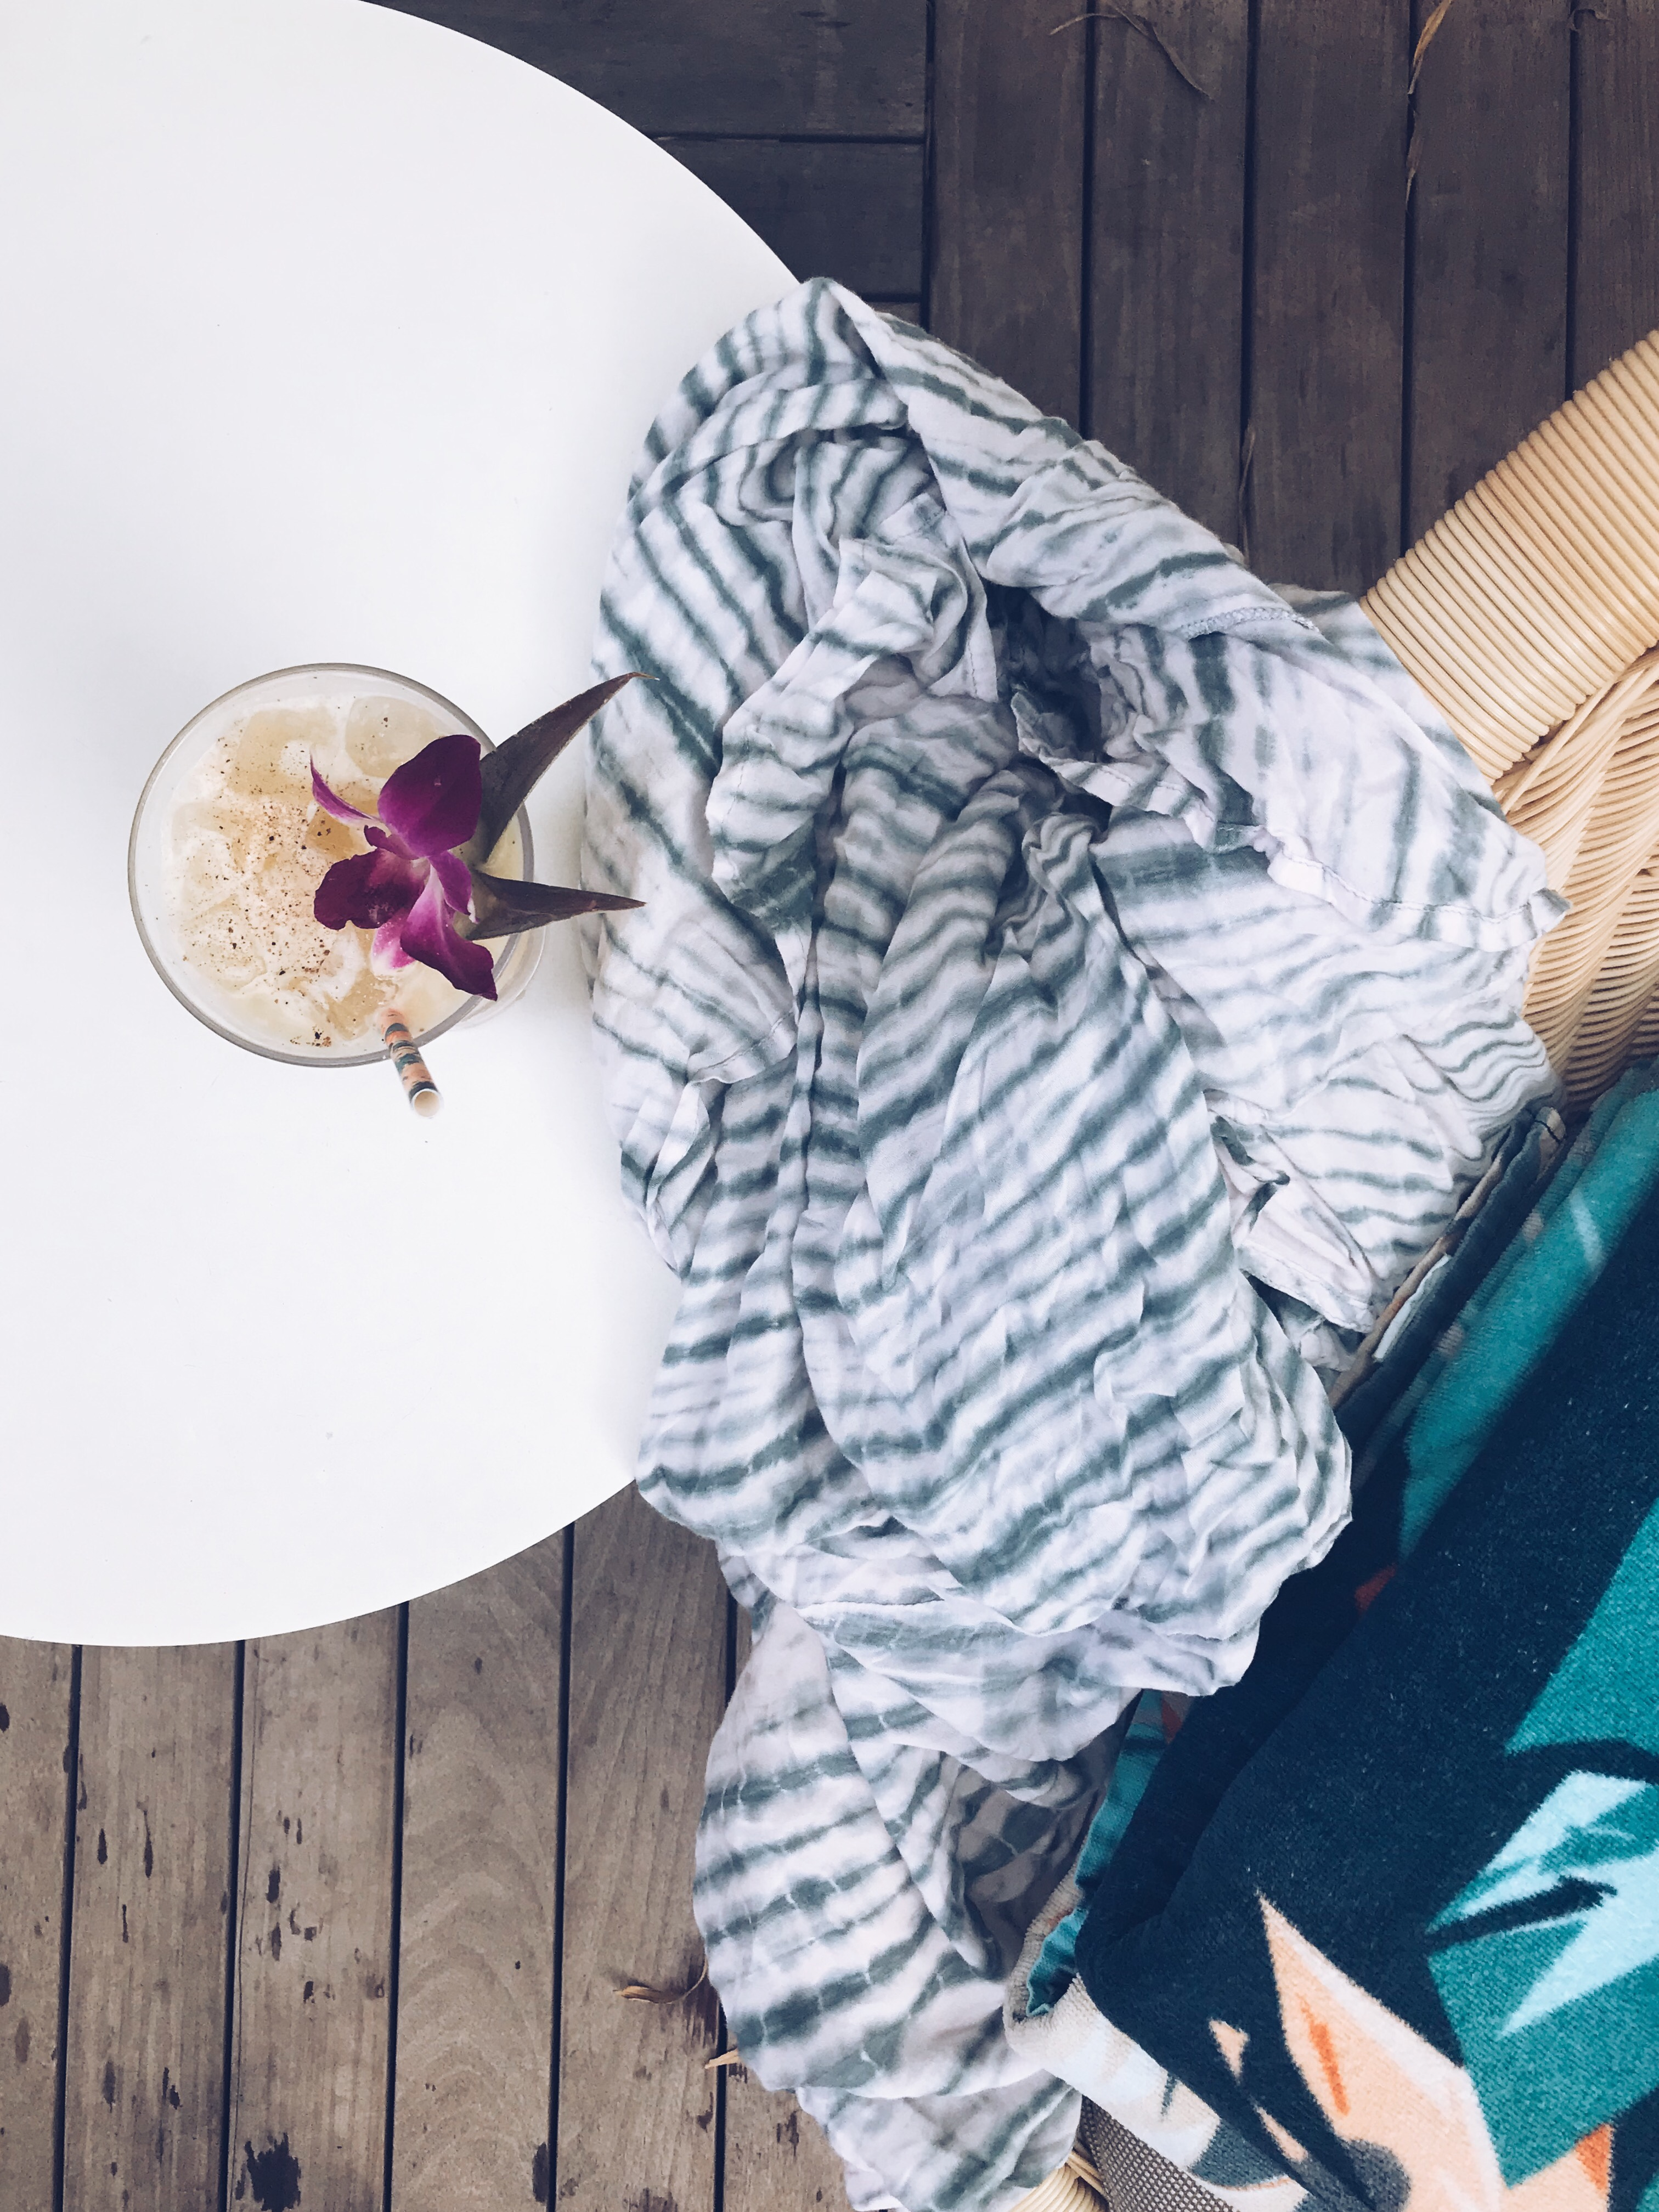 Umbrella drink, towels and sarong.